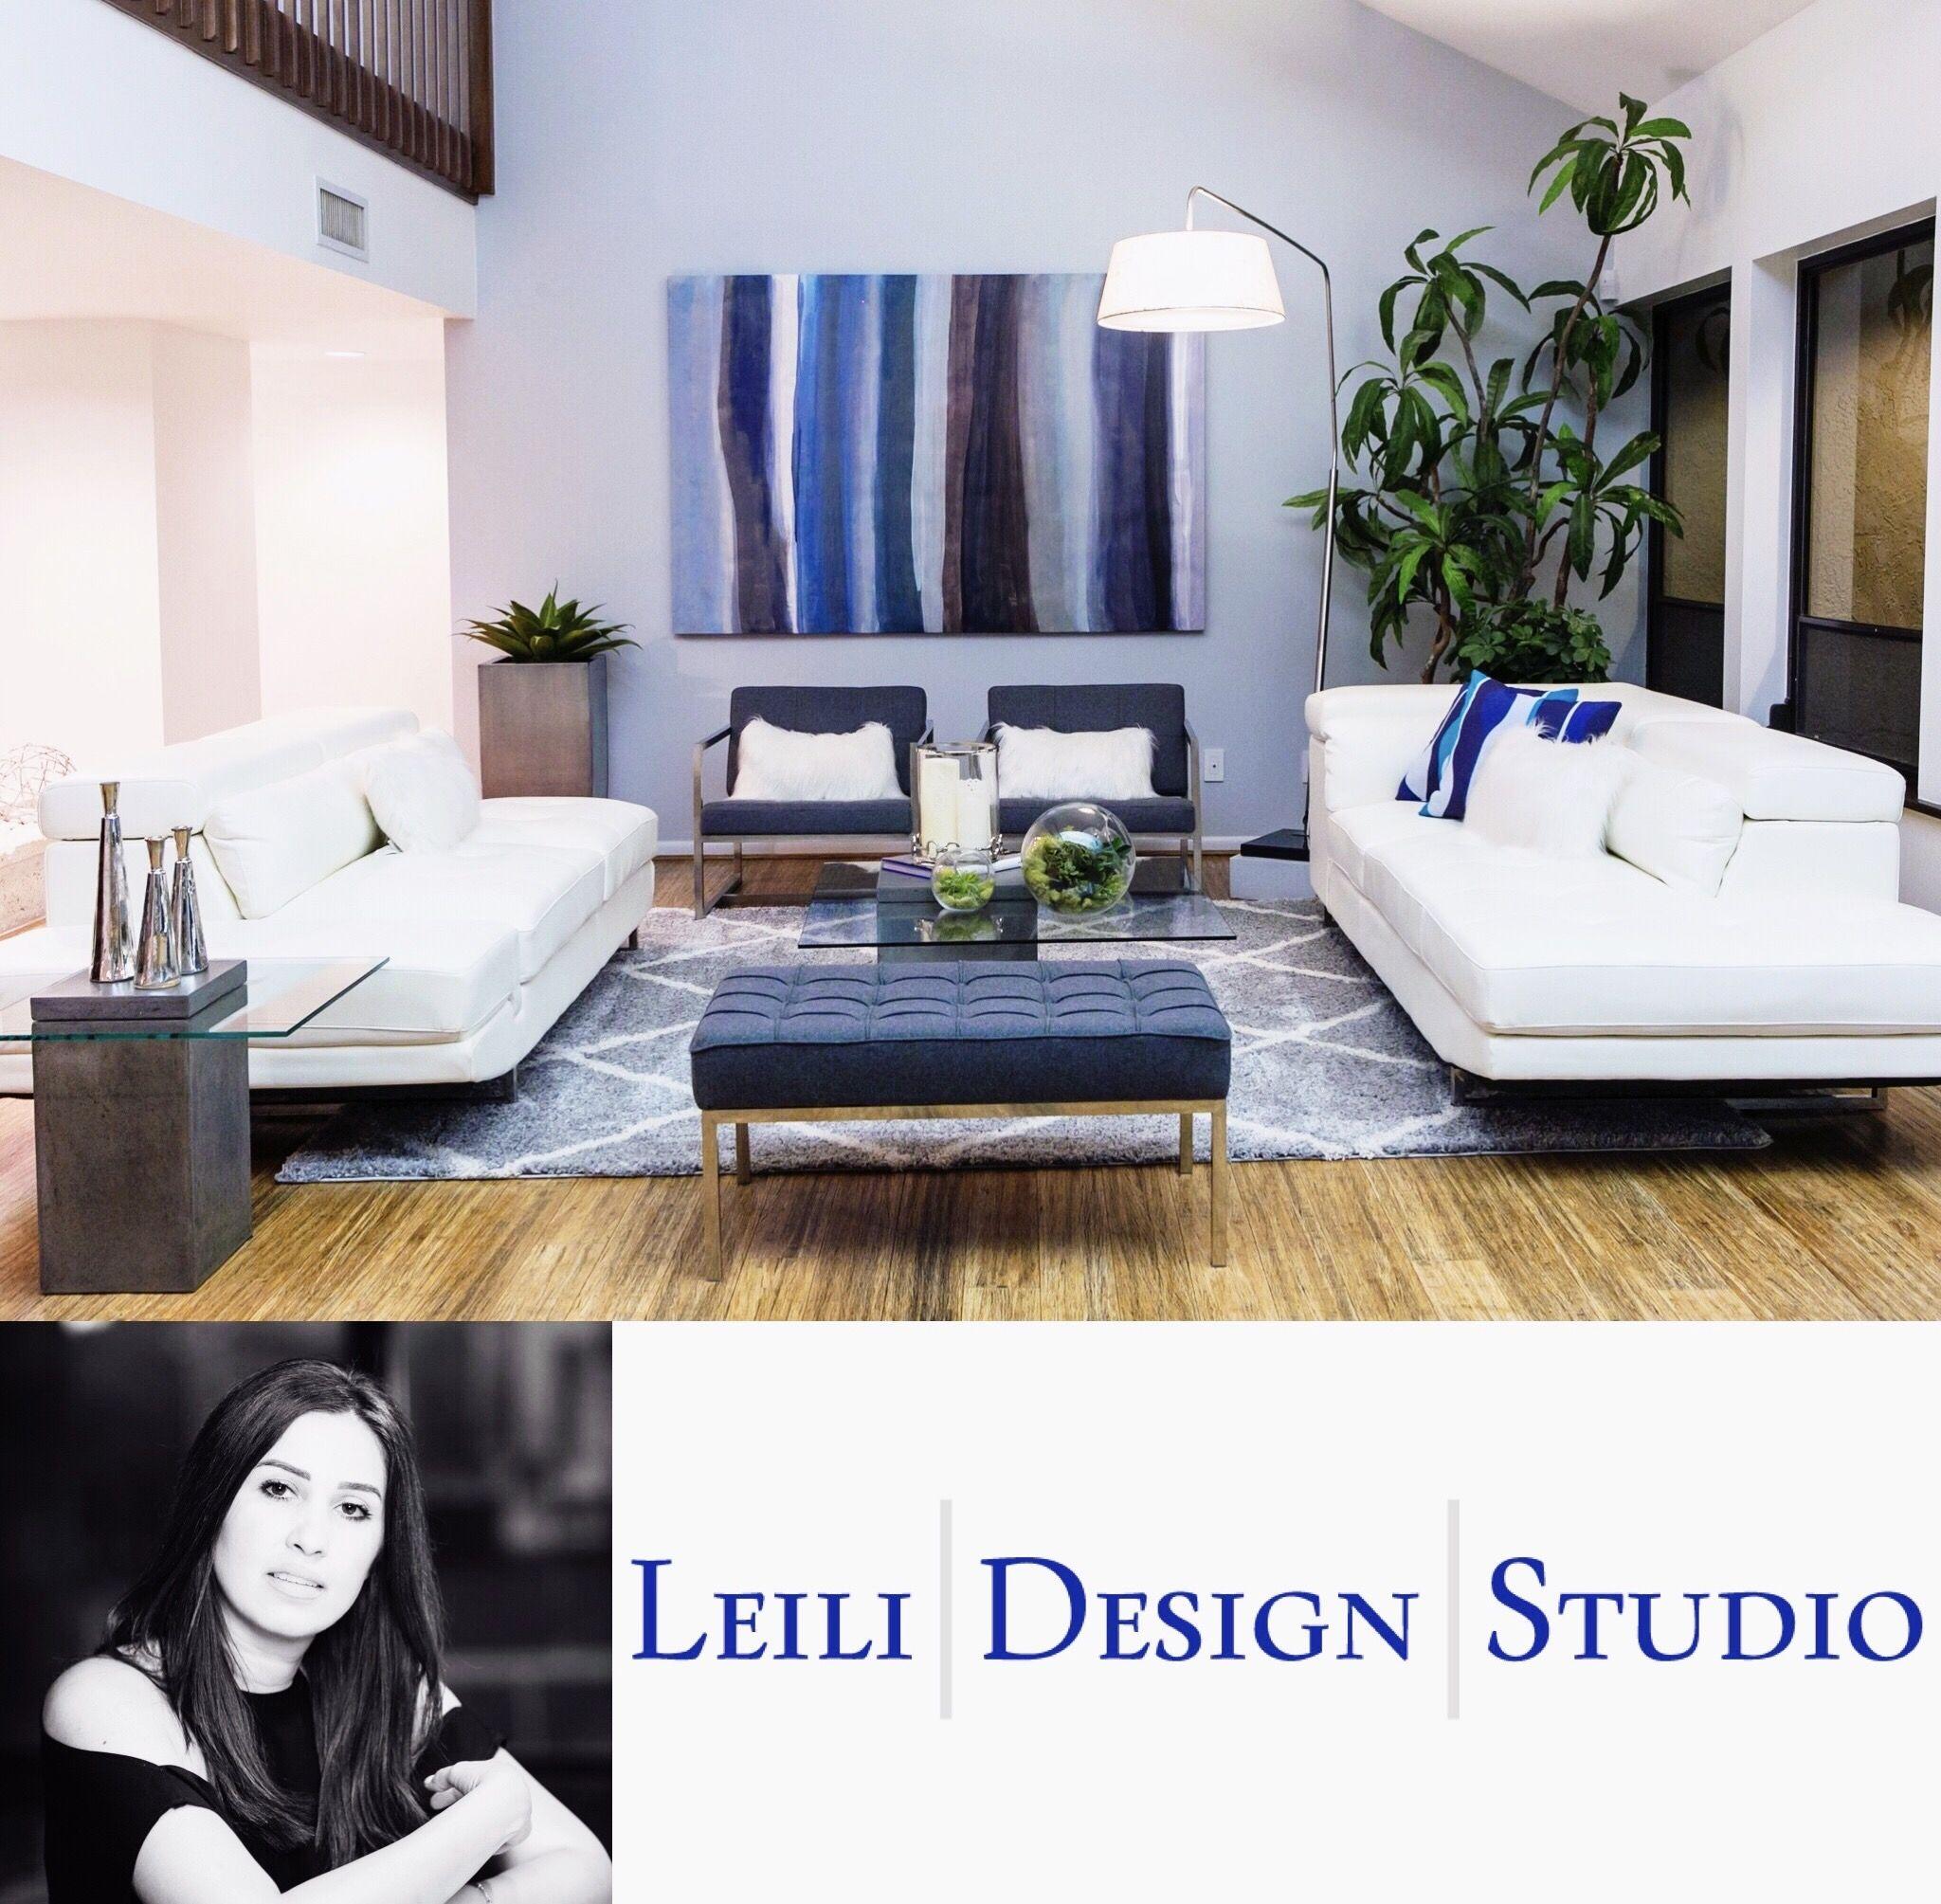 Pin By Leili Design Studio On Leili Design Studio With Images